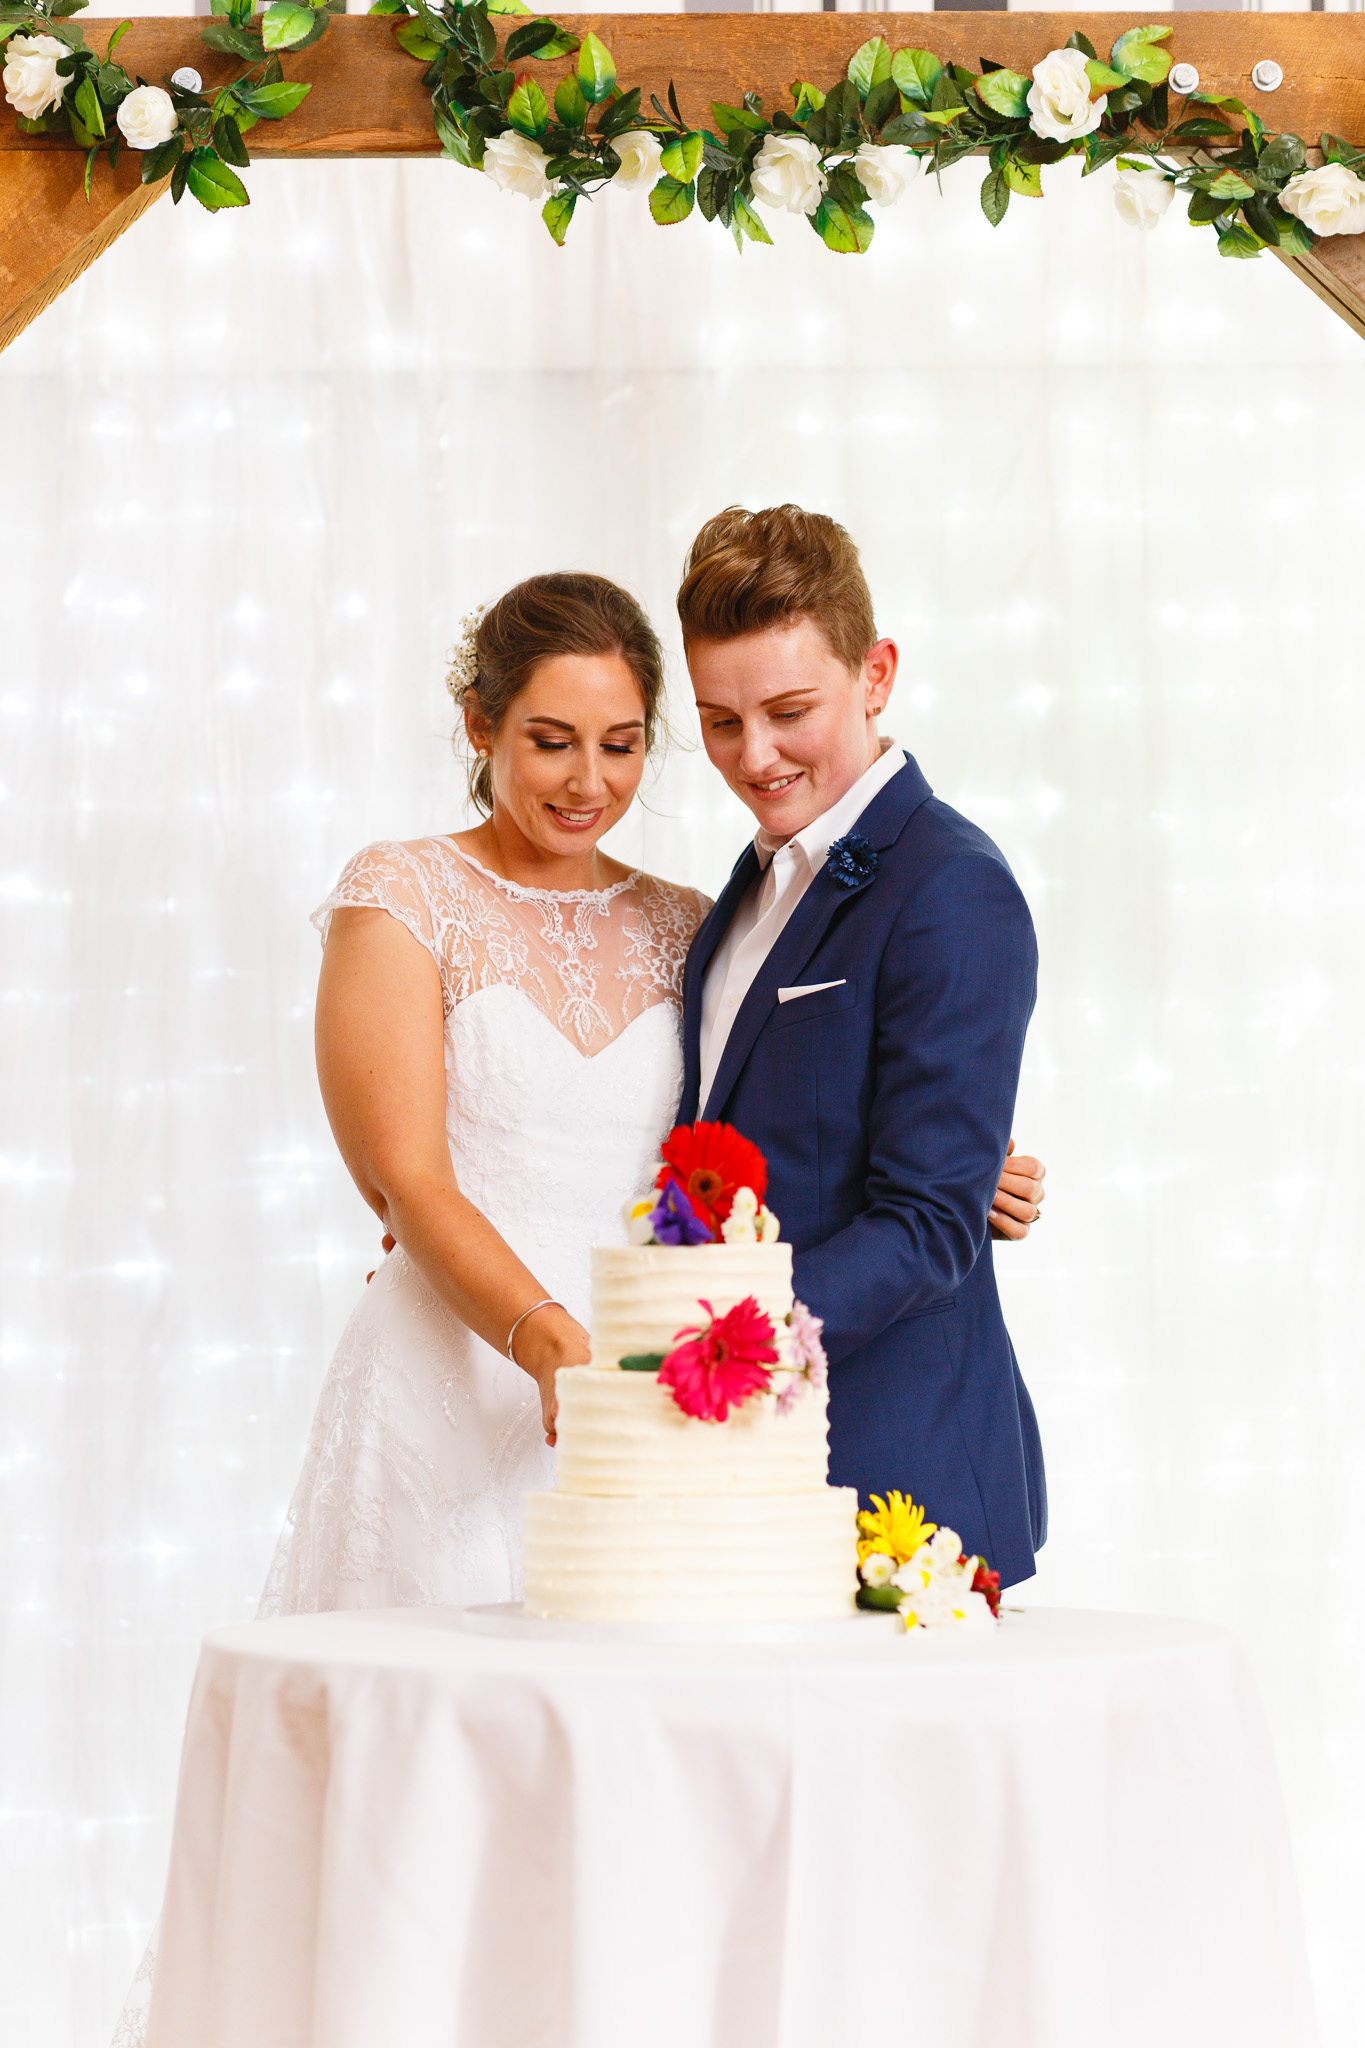 palmerston-north-wedding-photography-highlight-new-zealand.jpg-674.jpg